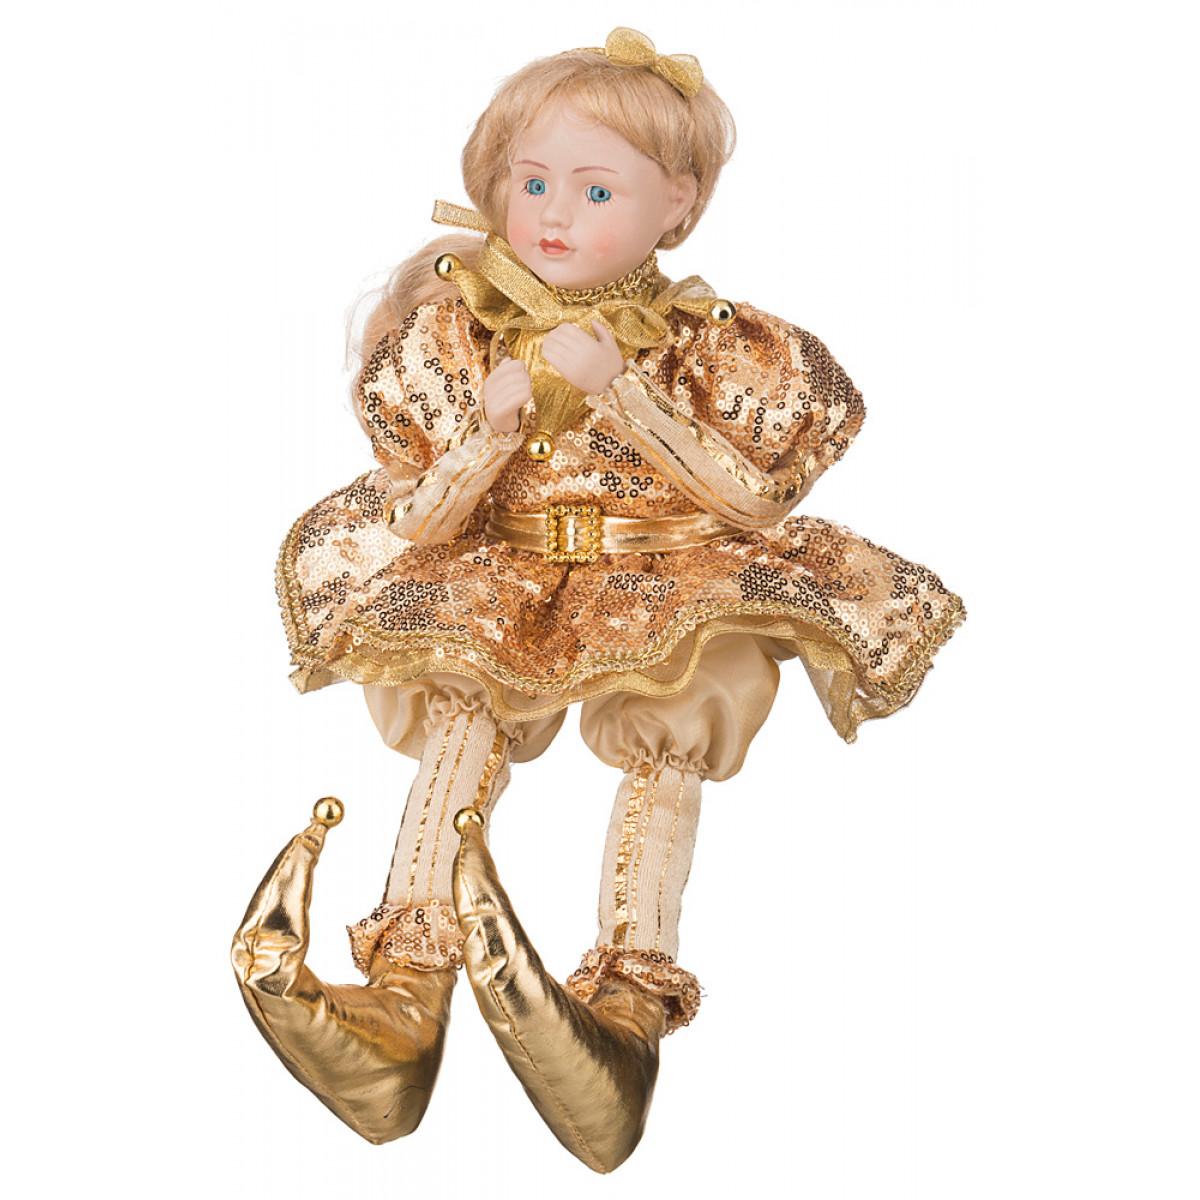 {} Lefard Интерьерная игрушка Maverick  (41 см) lefard интерьерная игрушка jan 5х6х13 см